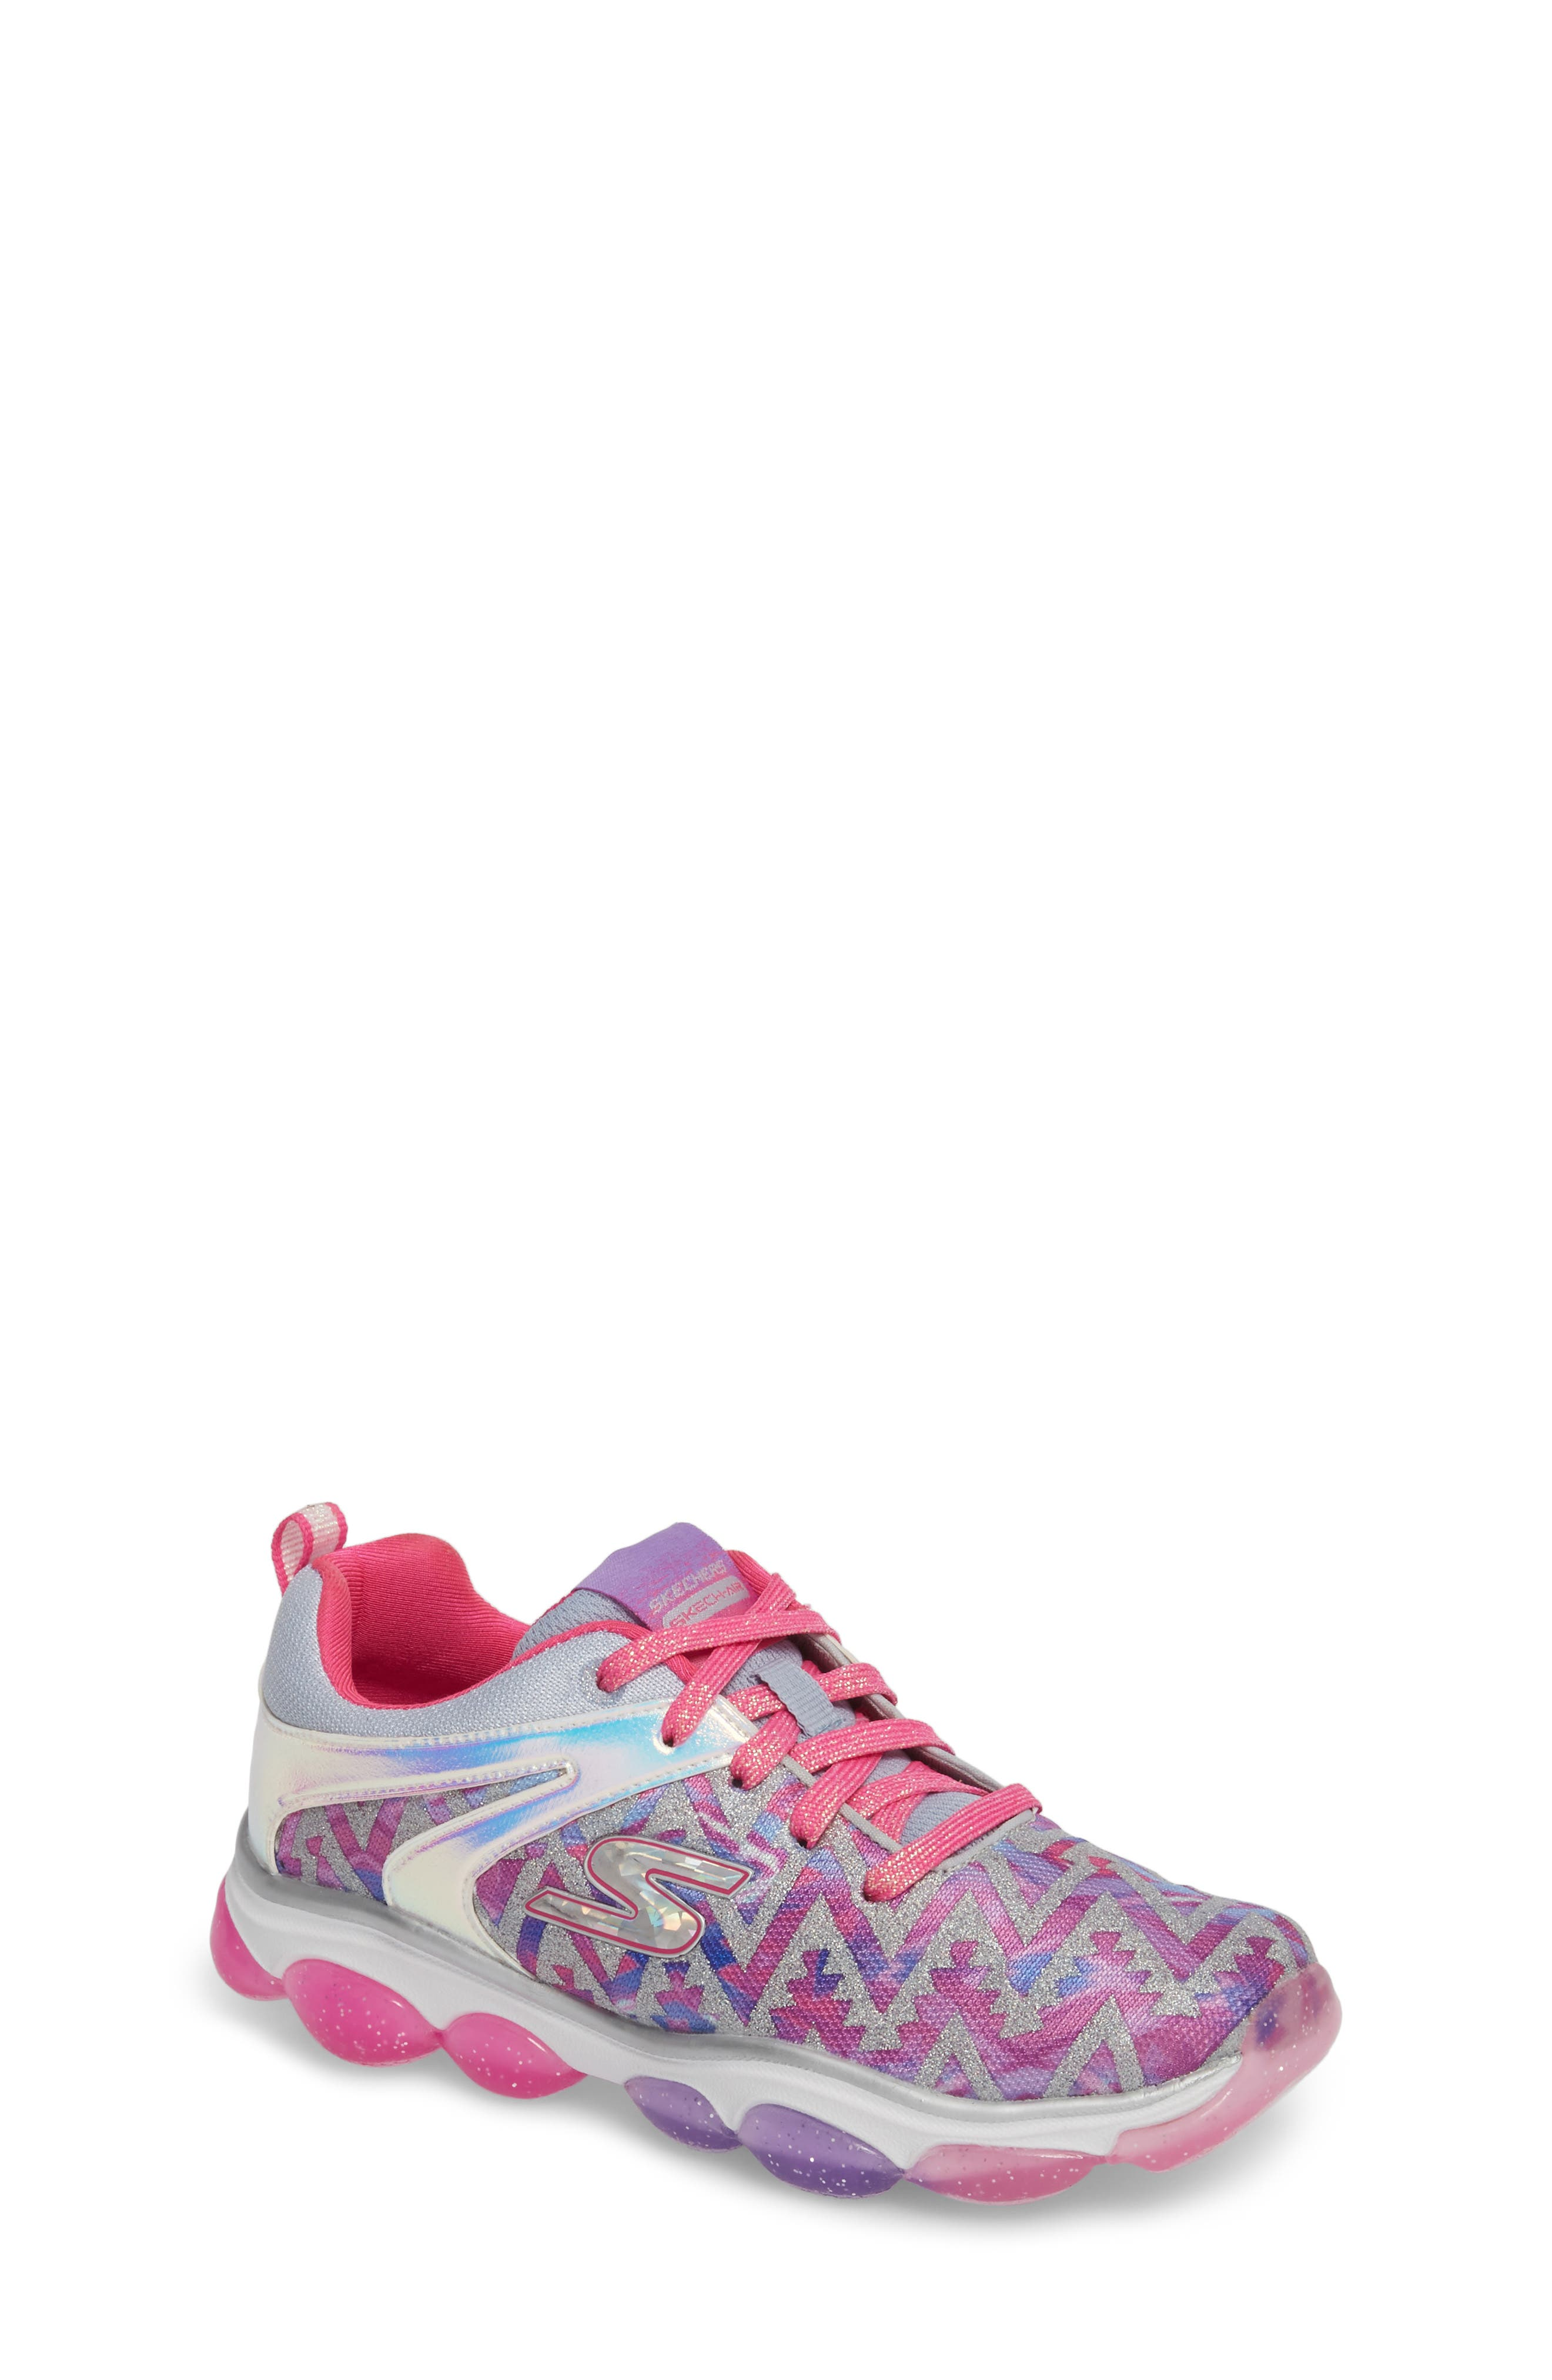 Skech Air Groove Glitter Sneaker,                         Main,                         color, PINK/ MULTI